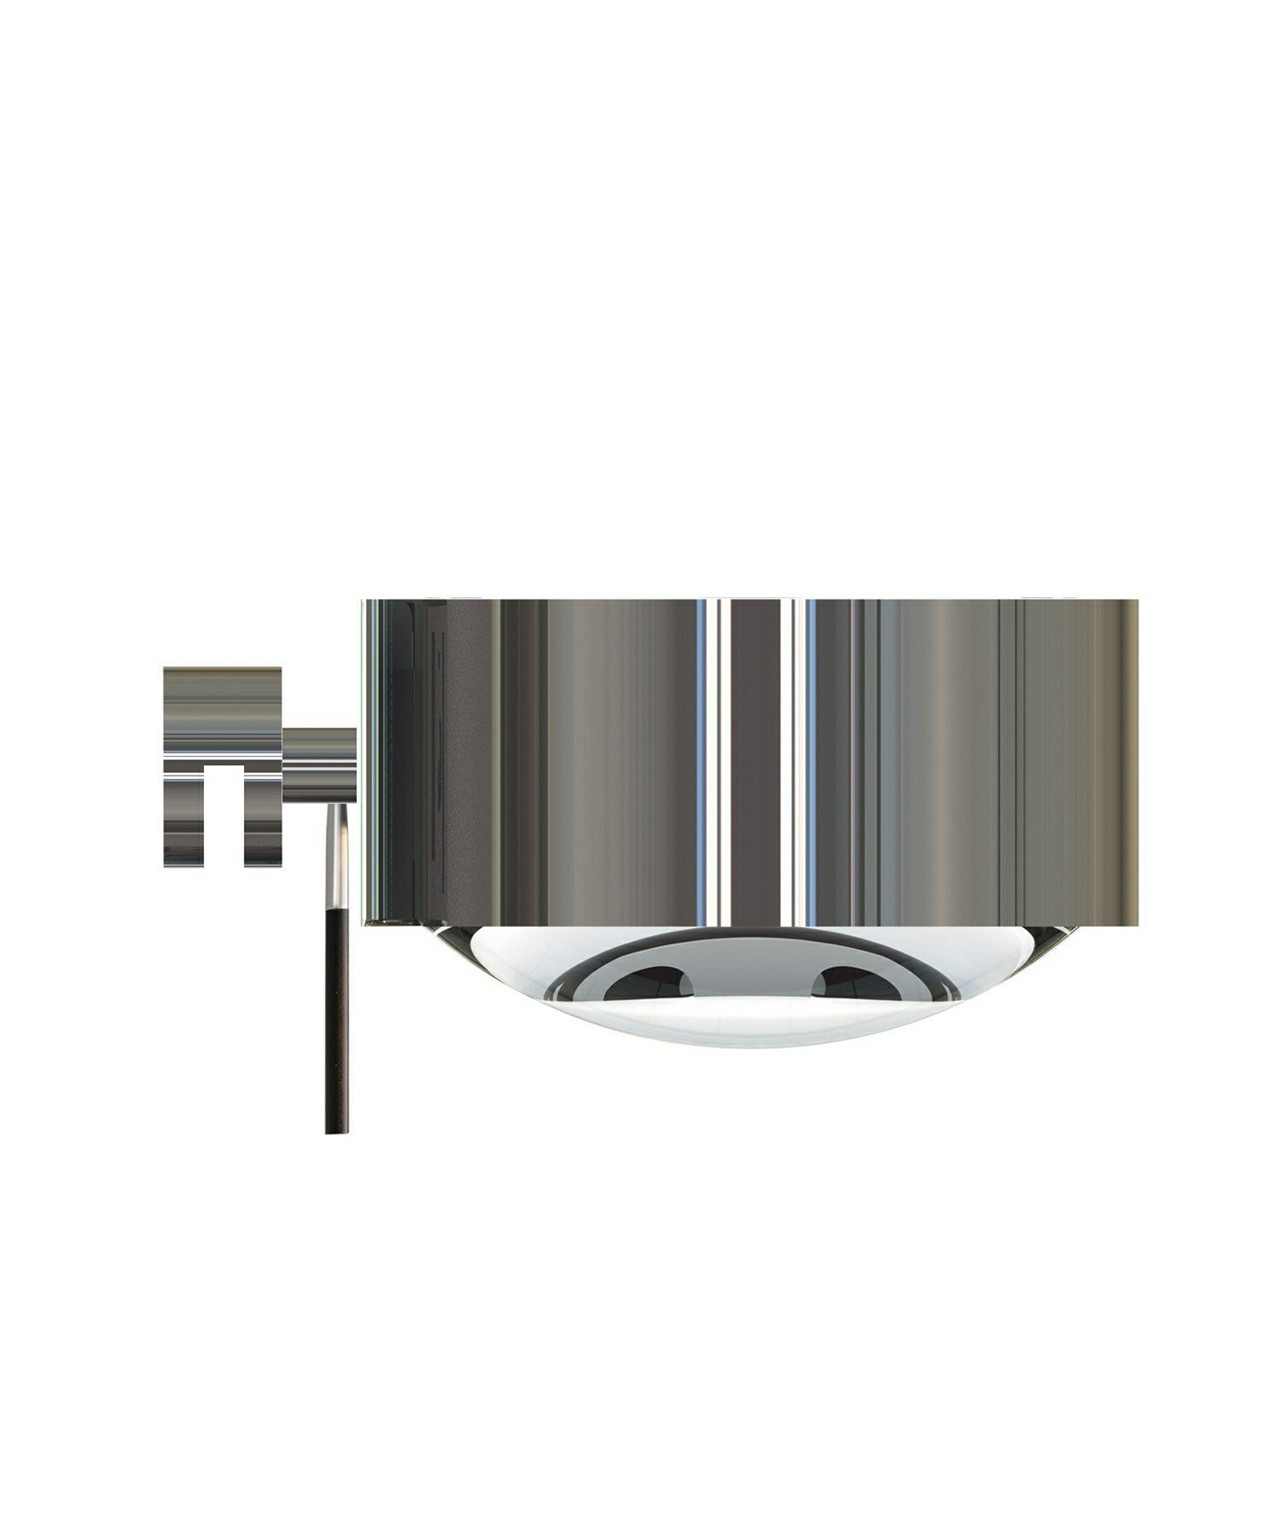 Puk Maxx Mirror Fix Vegglampe Halogen Krom - Top Light